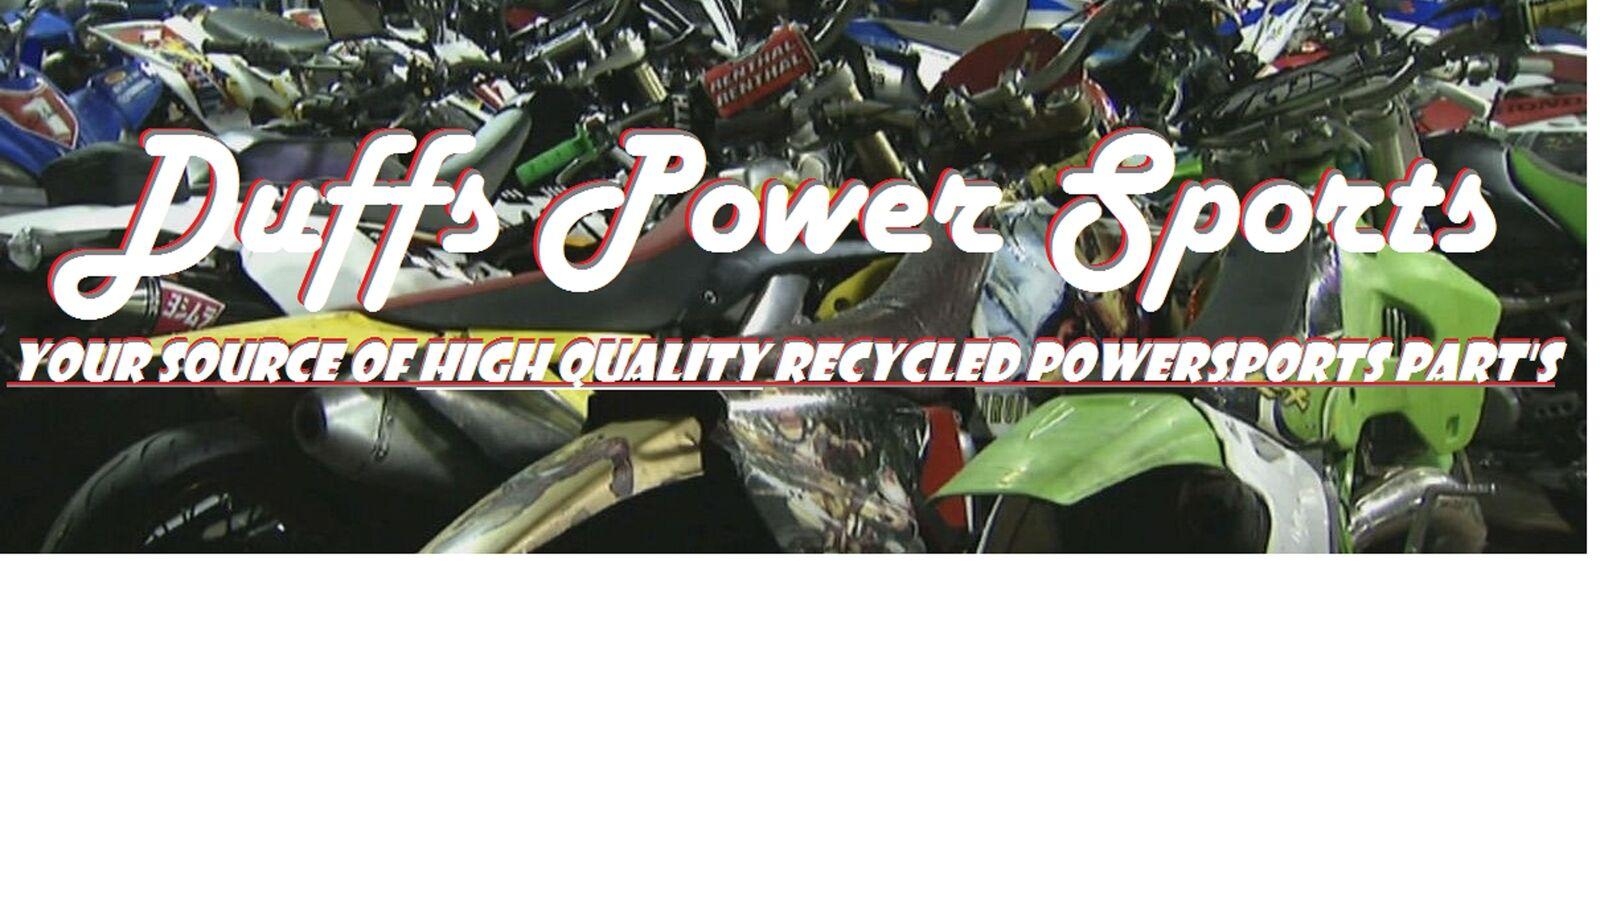 Duffs Power Sports